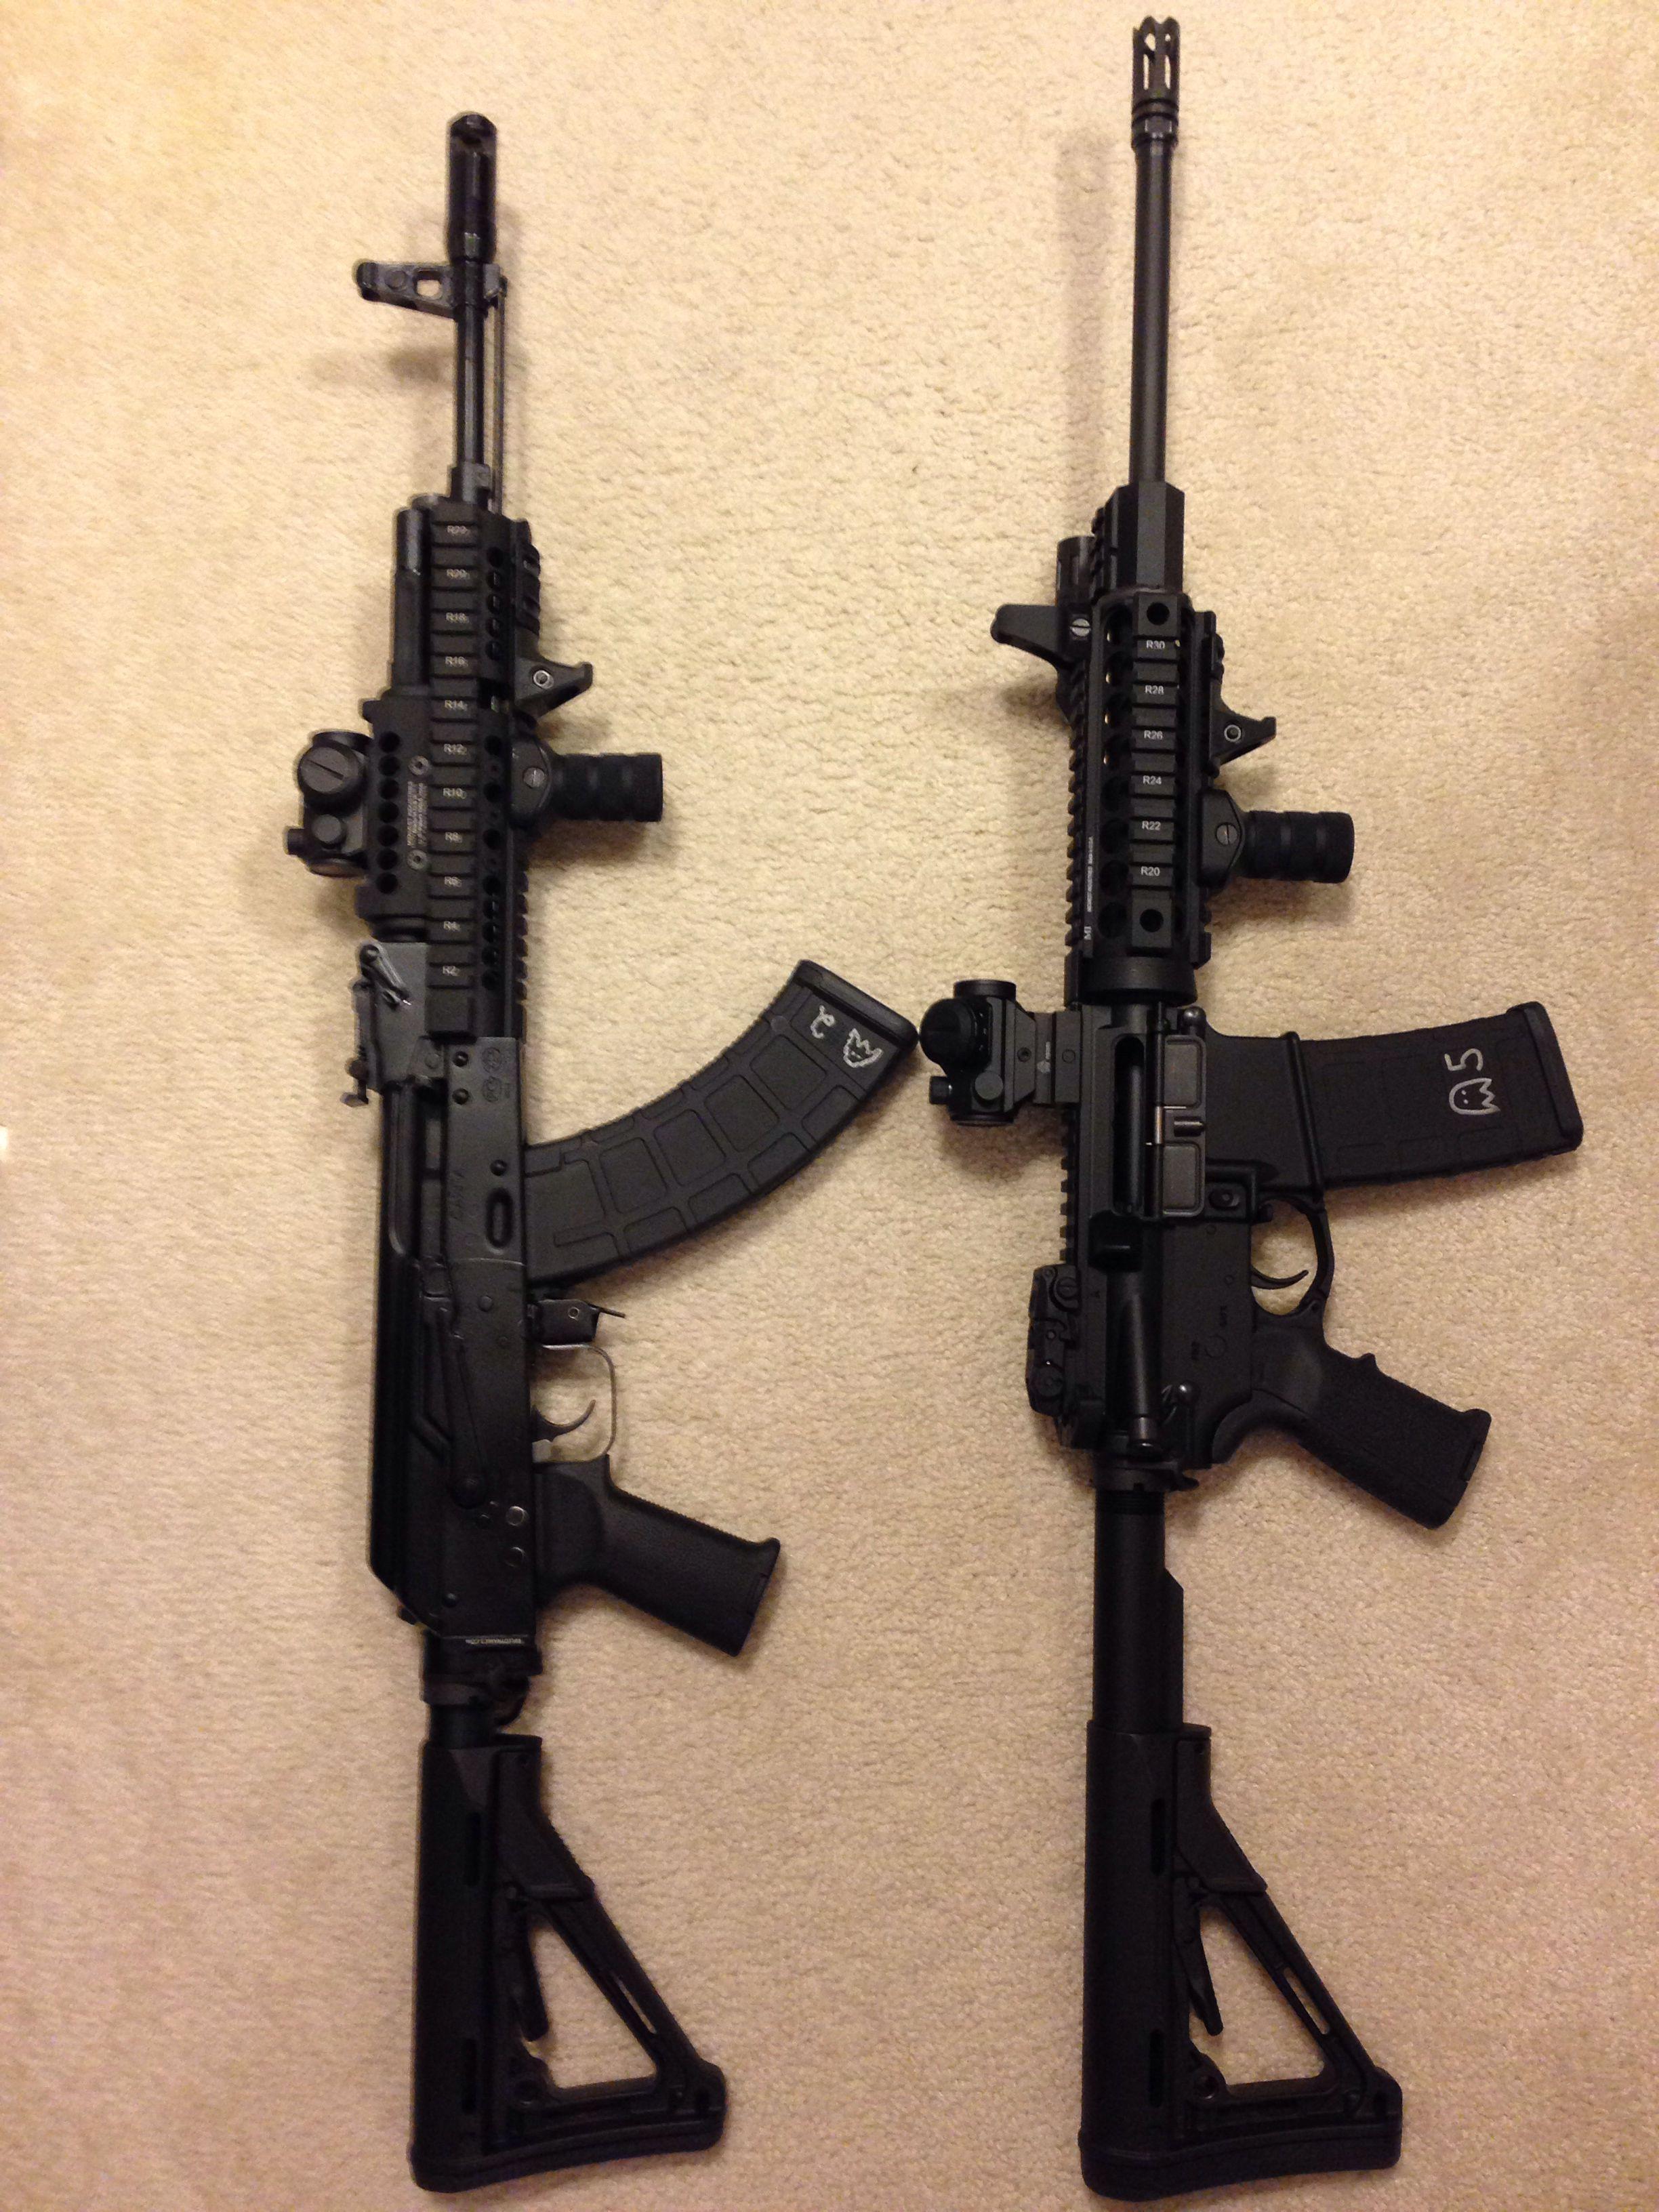 Tactical AR15 & AK47 Saiga, Dpms, MidwestIndustries,Inforce